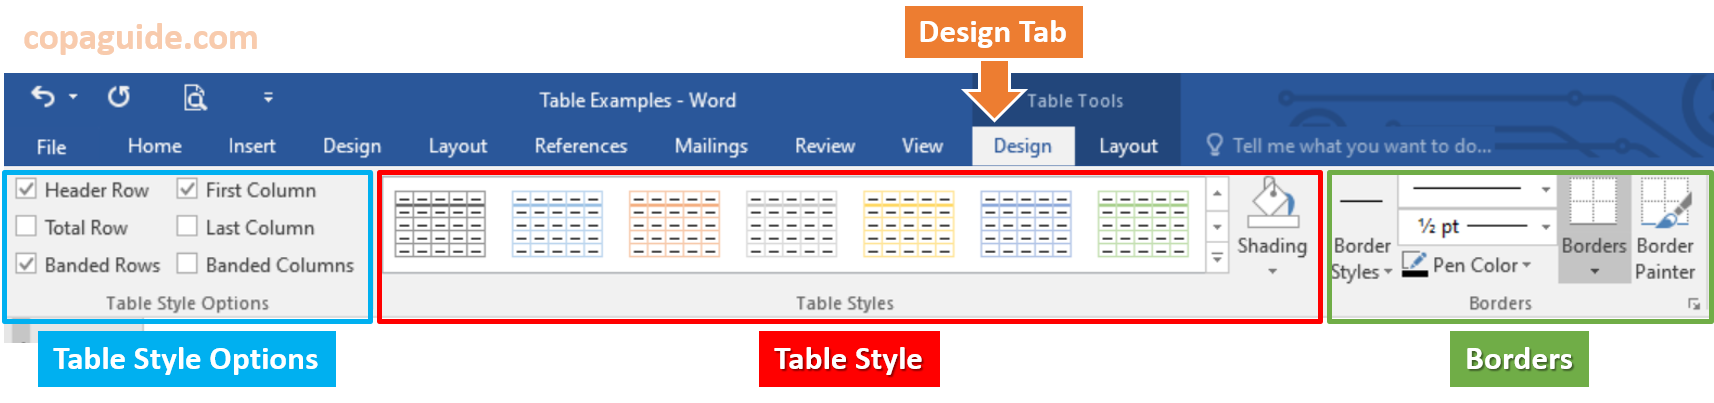 Microsoft Word - Table Formatting Design Tab